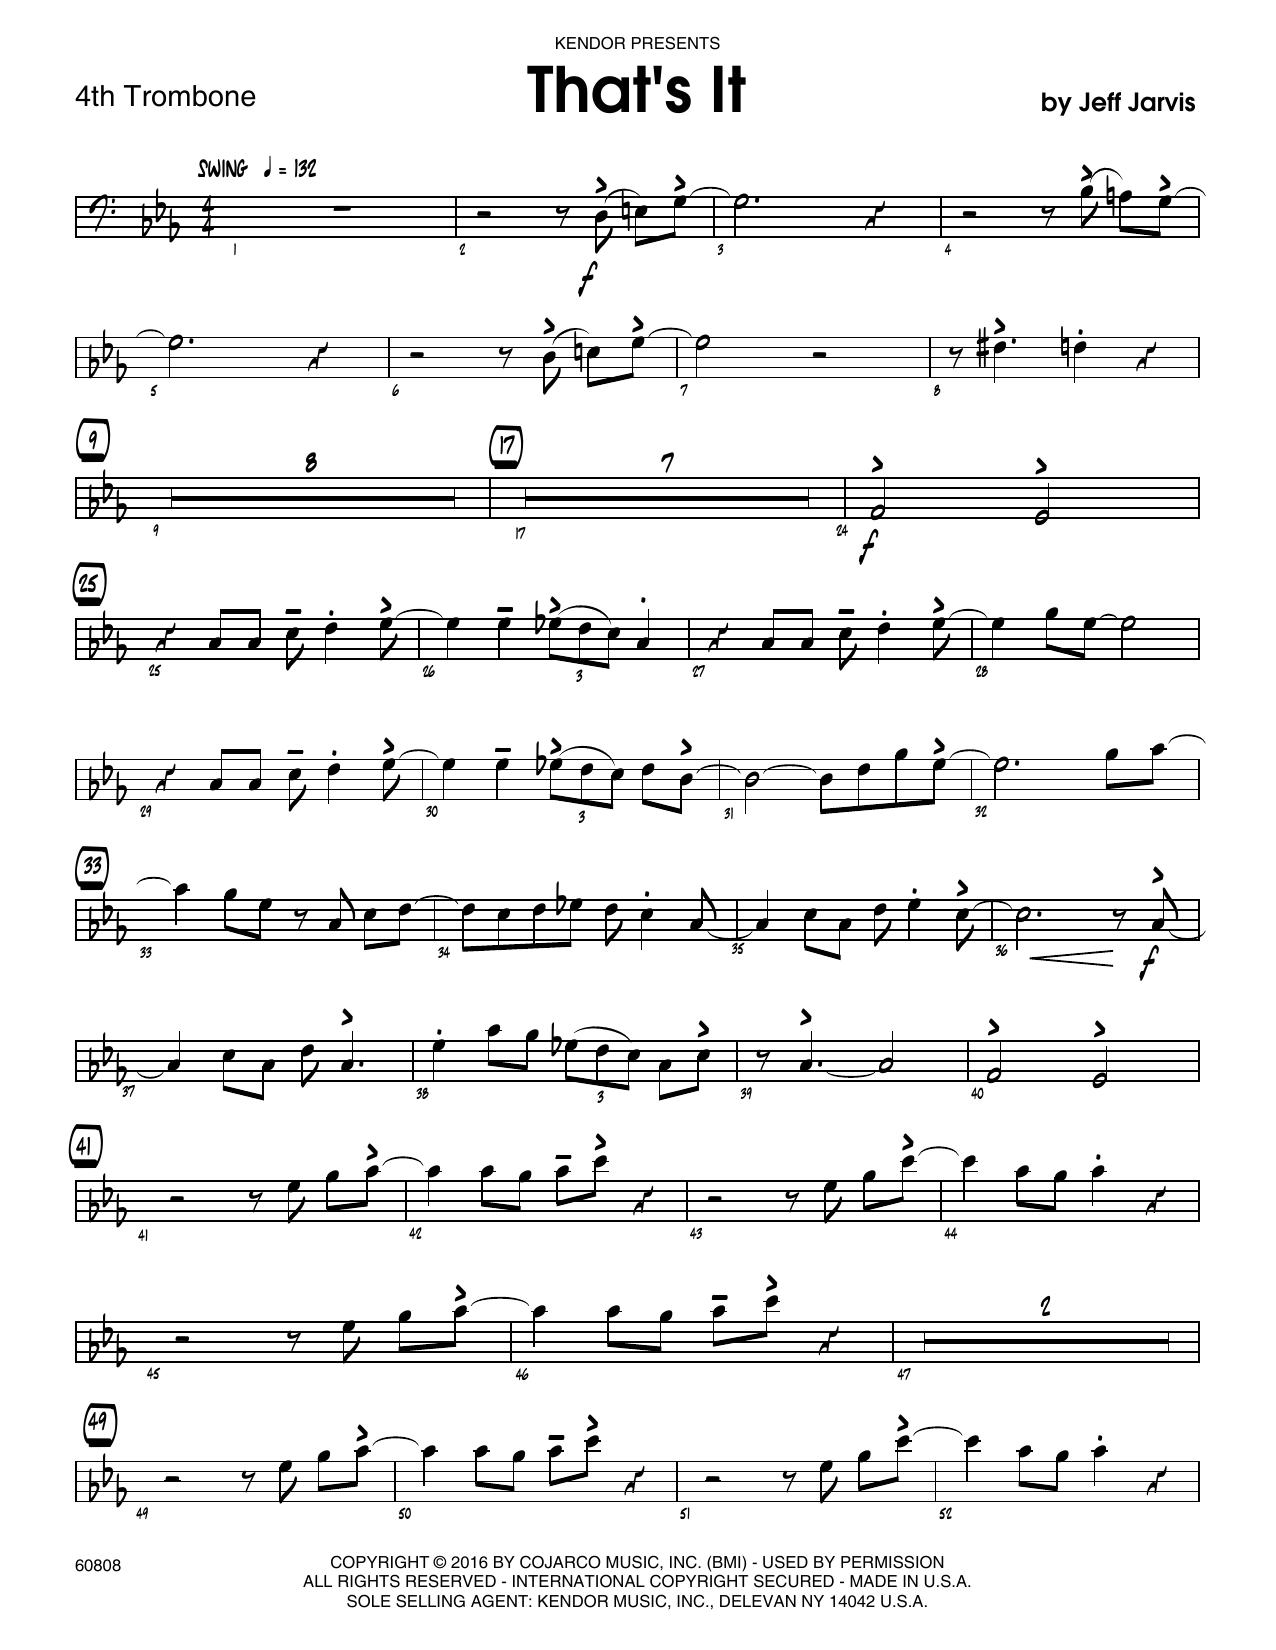 That's It - 4th Trombone Sheet Music